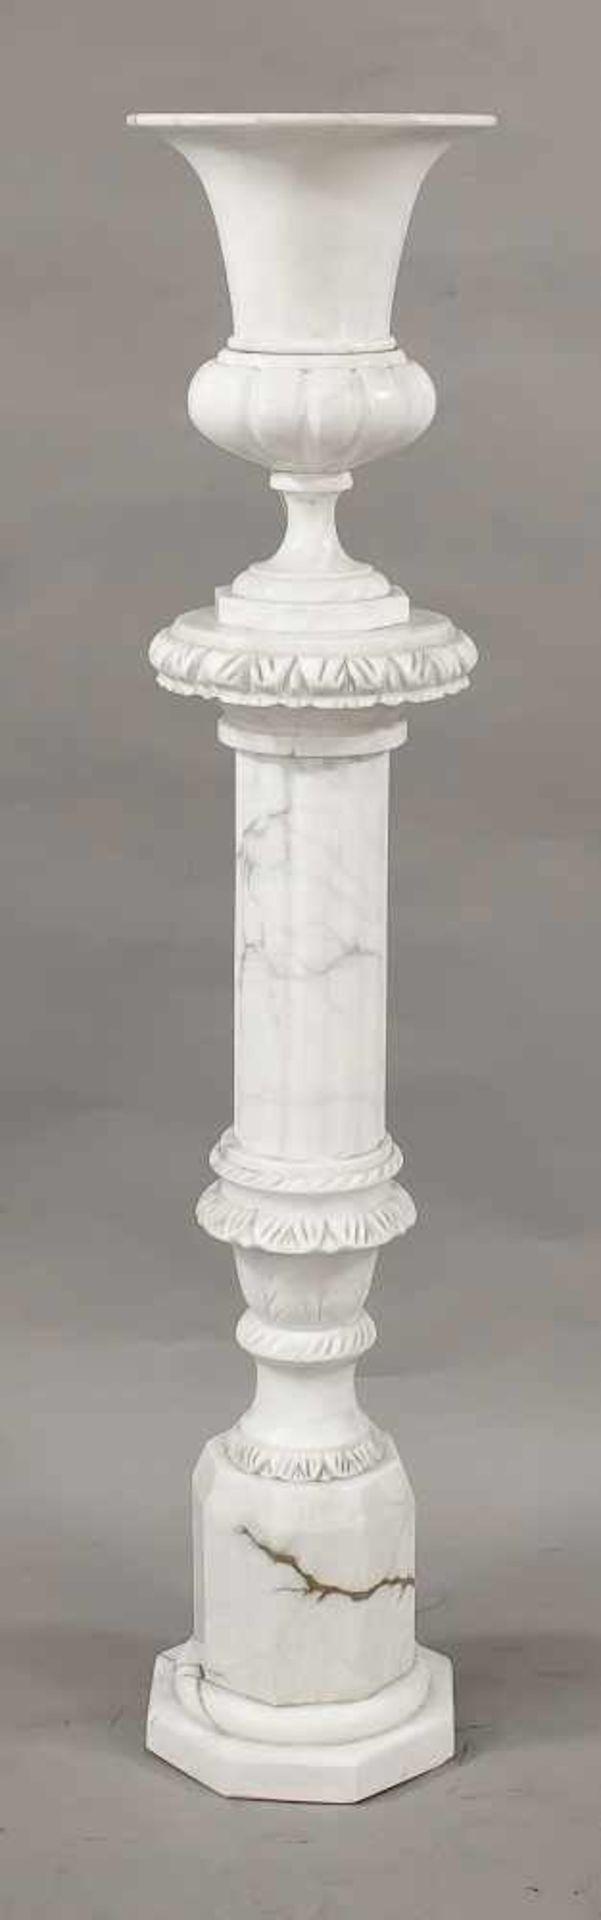 Vasenlampe auf Säulenpostament, Mitte 20. Jh., Marmor. Oktogonales Postament auf